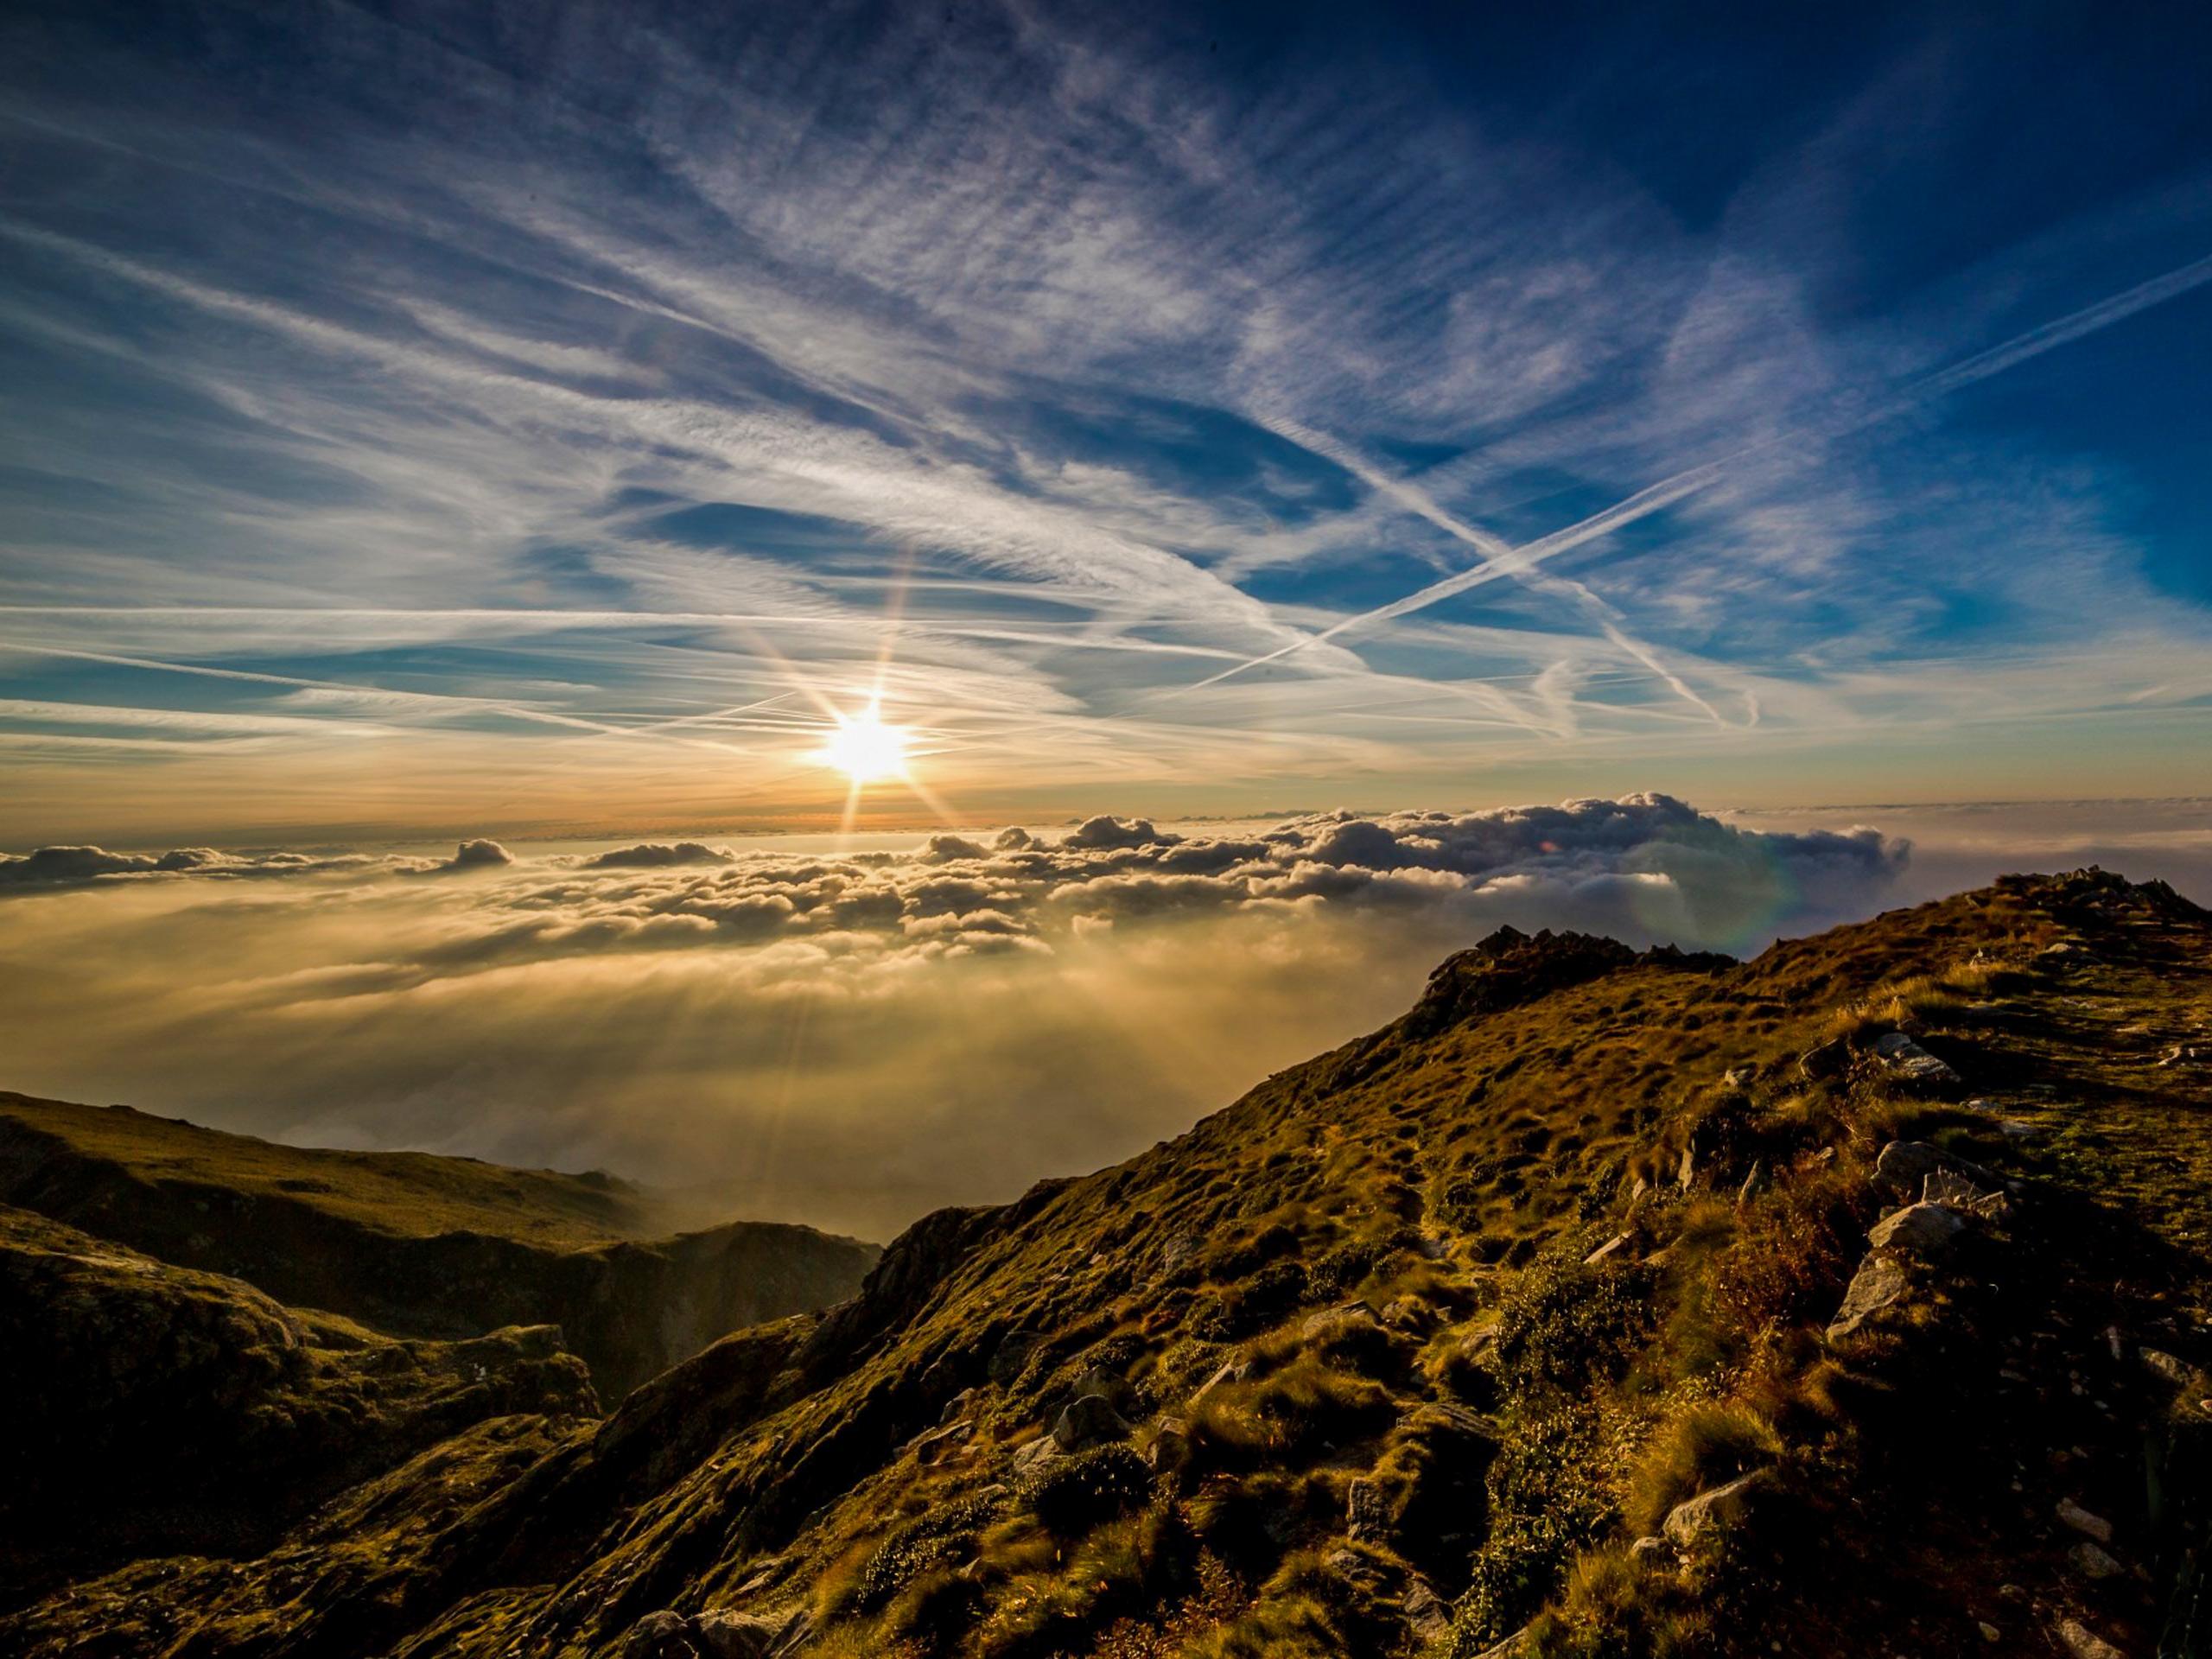 Amazing sunrise in Slovenia mountains